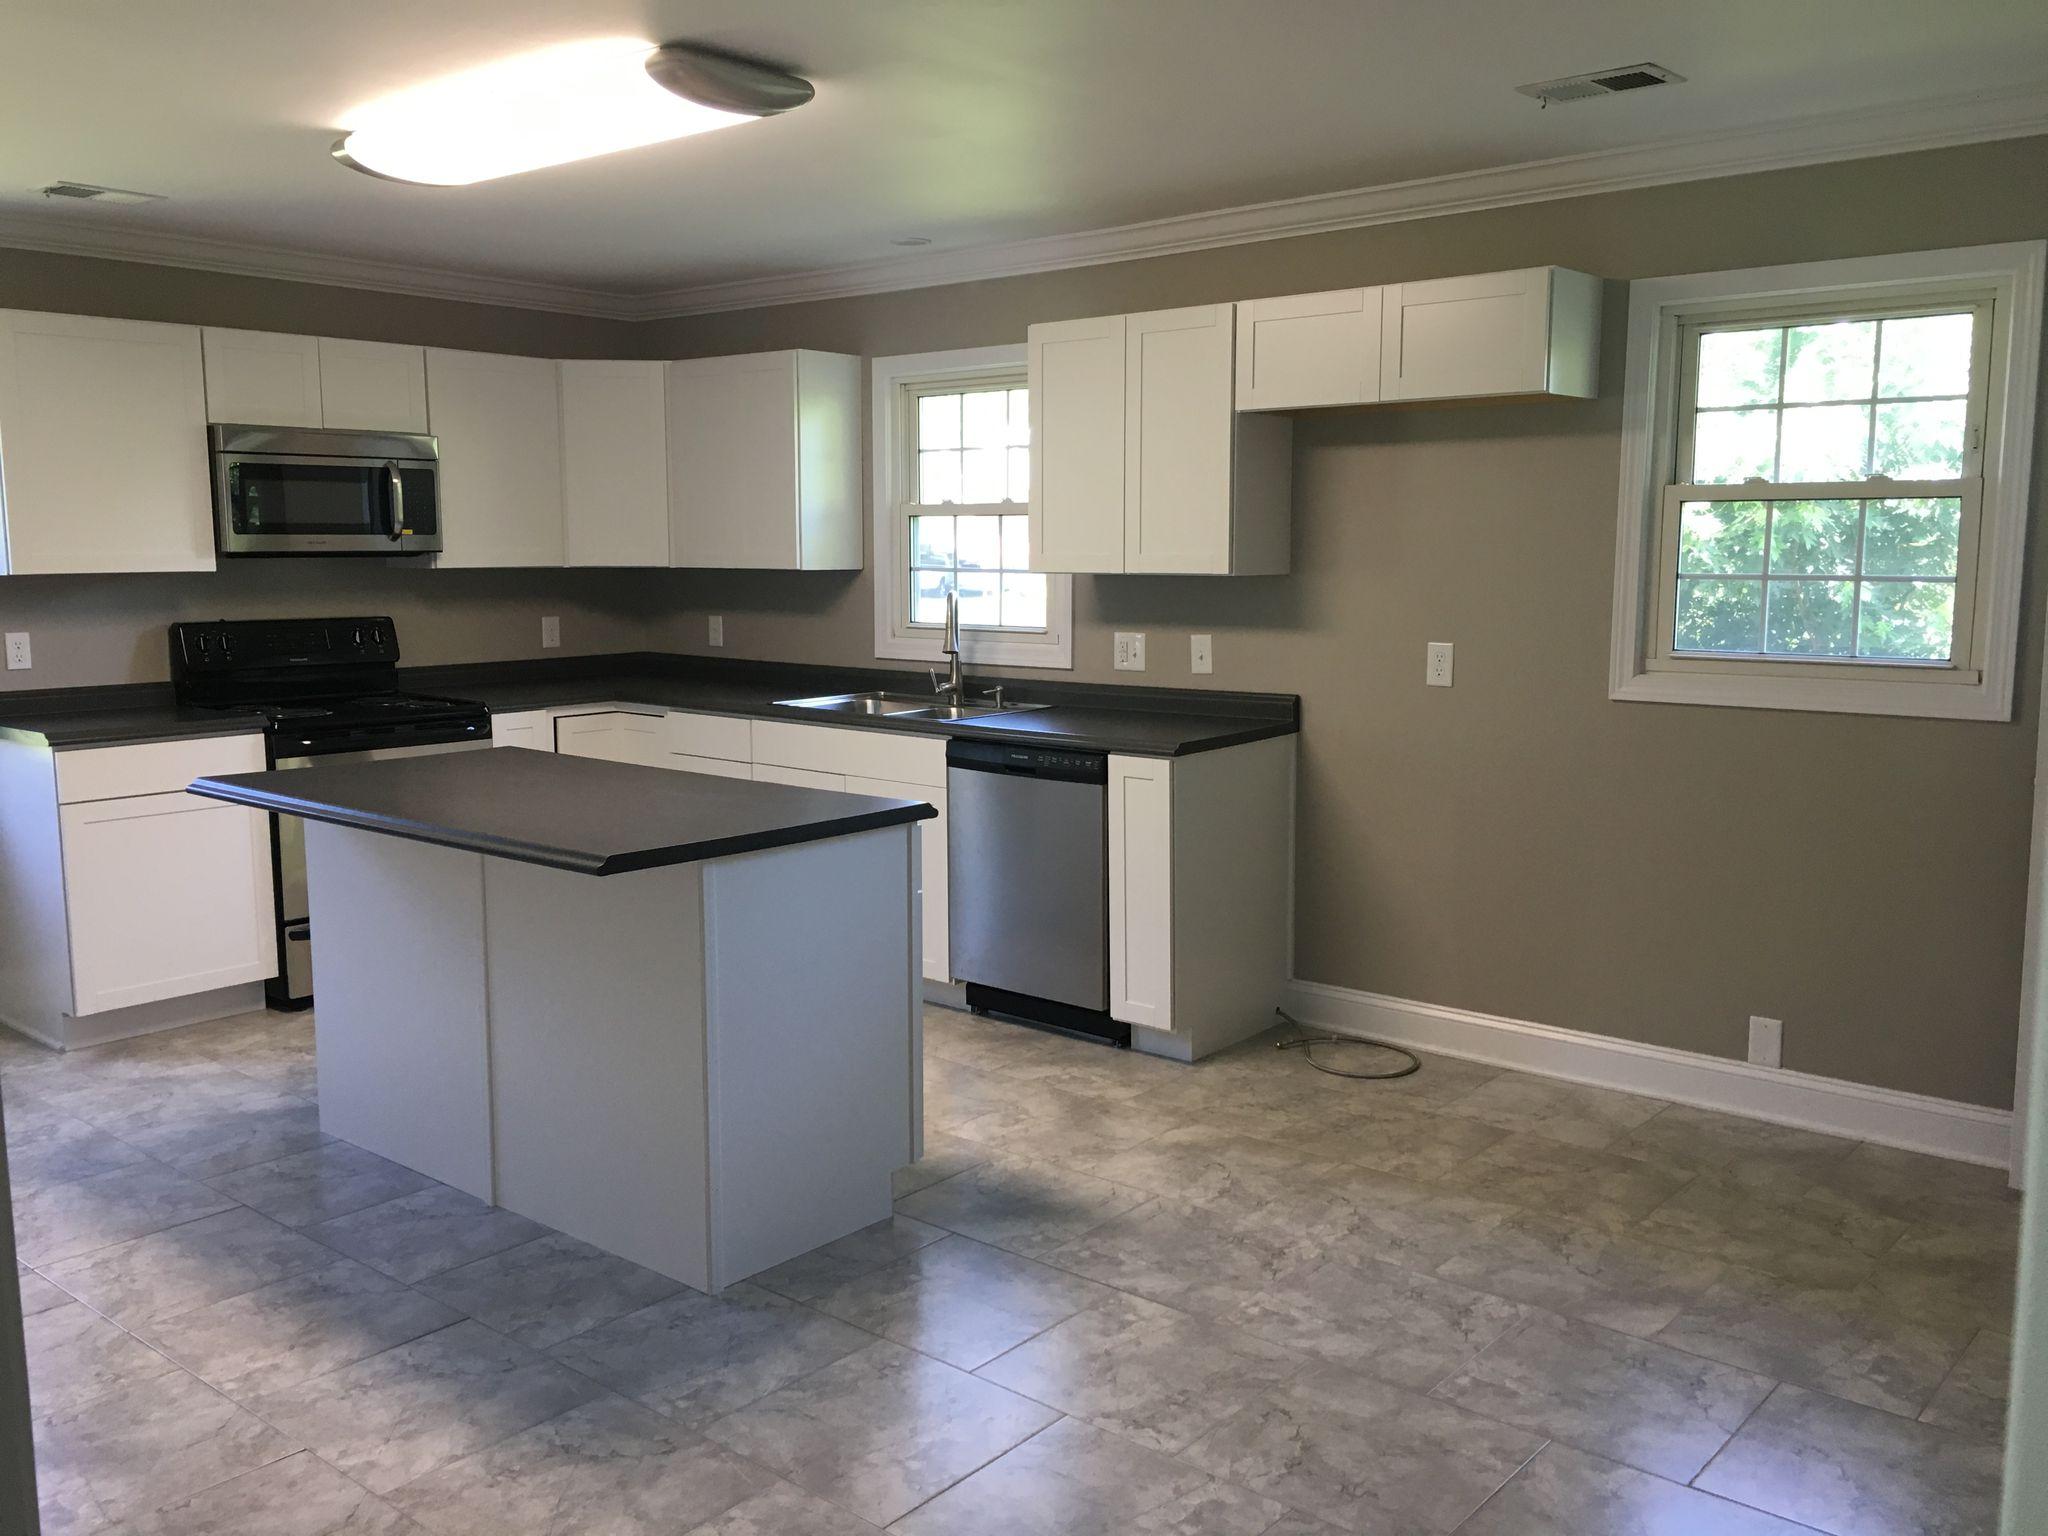 Kitchen cabinets johnson city tn - 121 Sunnyview Ct